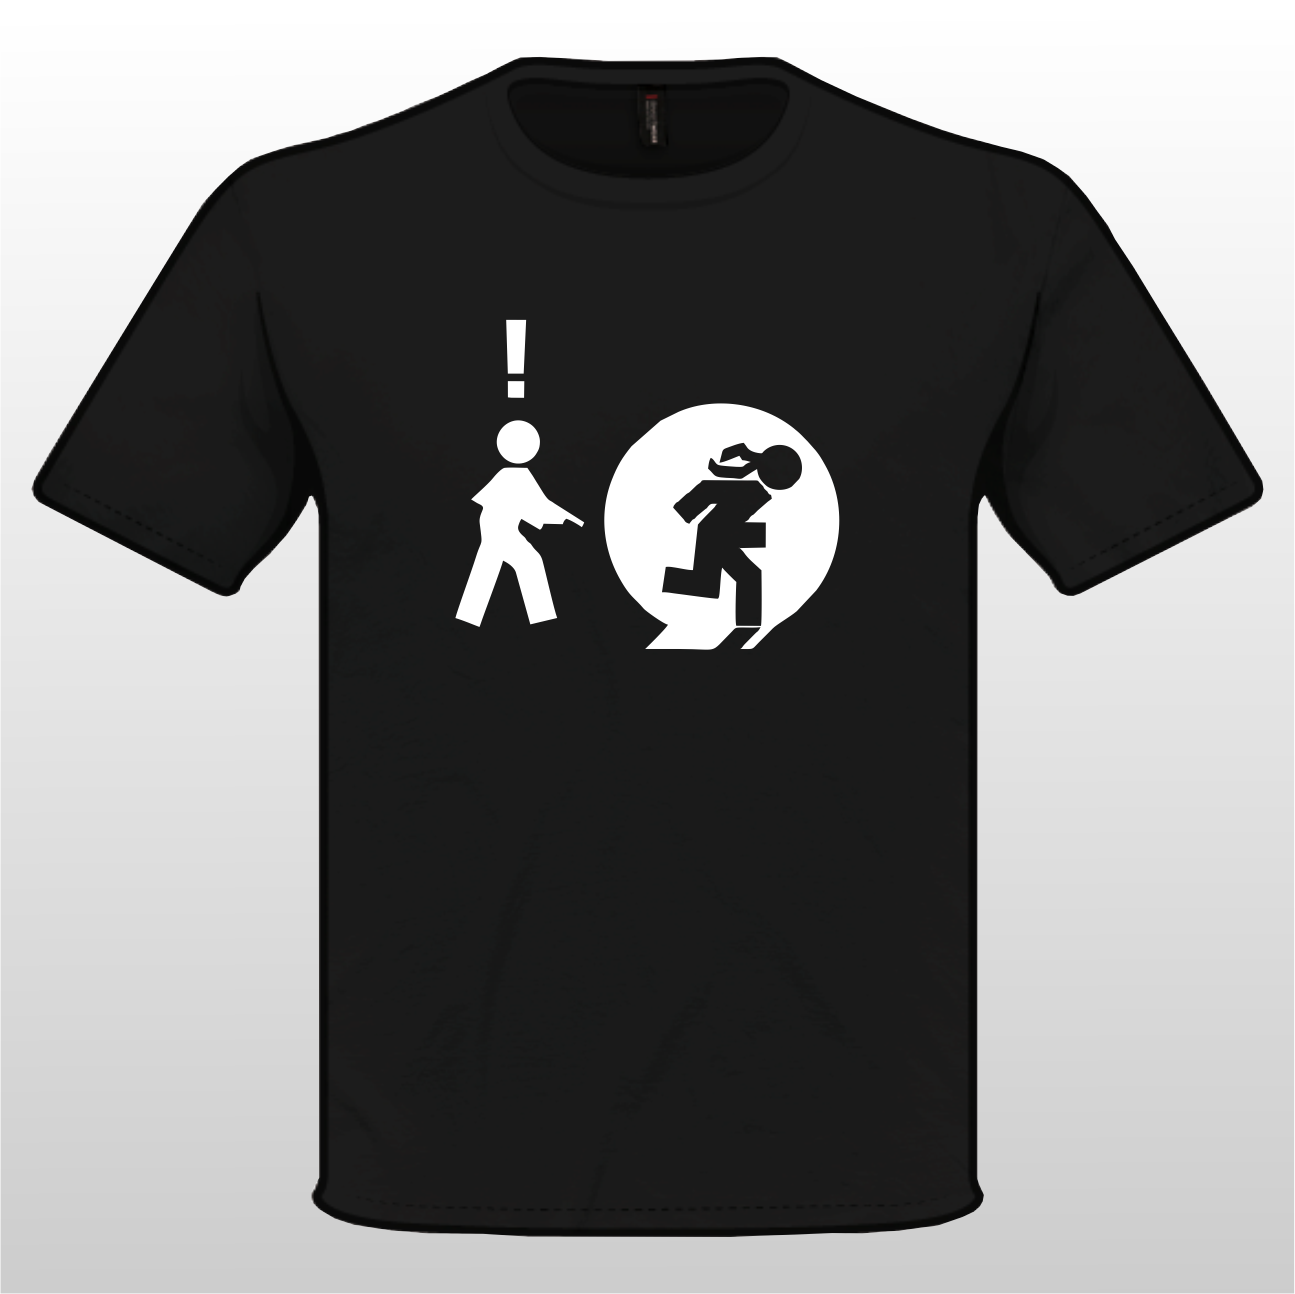 Metal Gear Solid Enemy Alert Parody Graphic Tee Shirt Graphic Tee Shirts Mens Tops Mens Tshirts